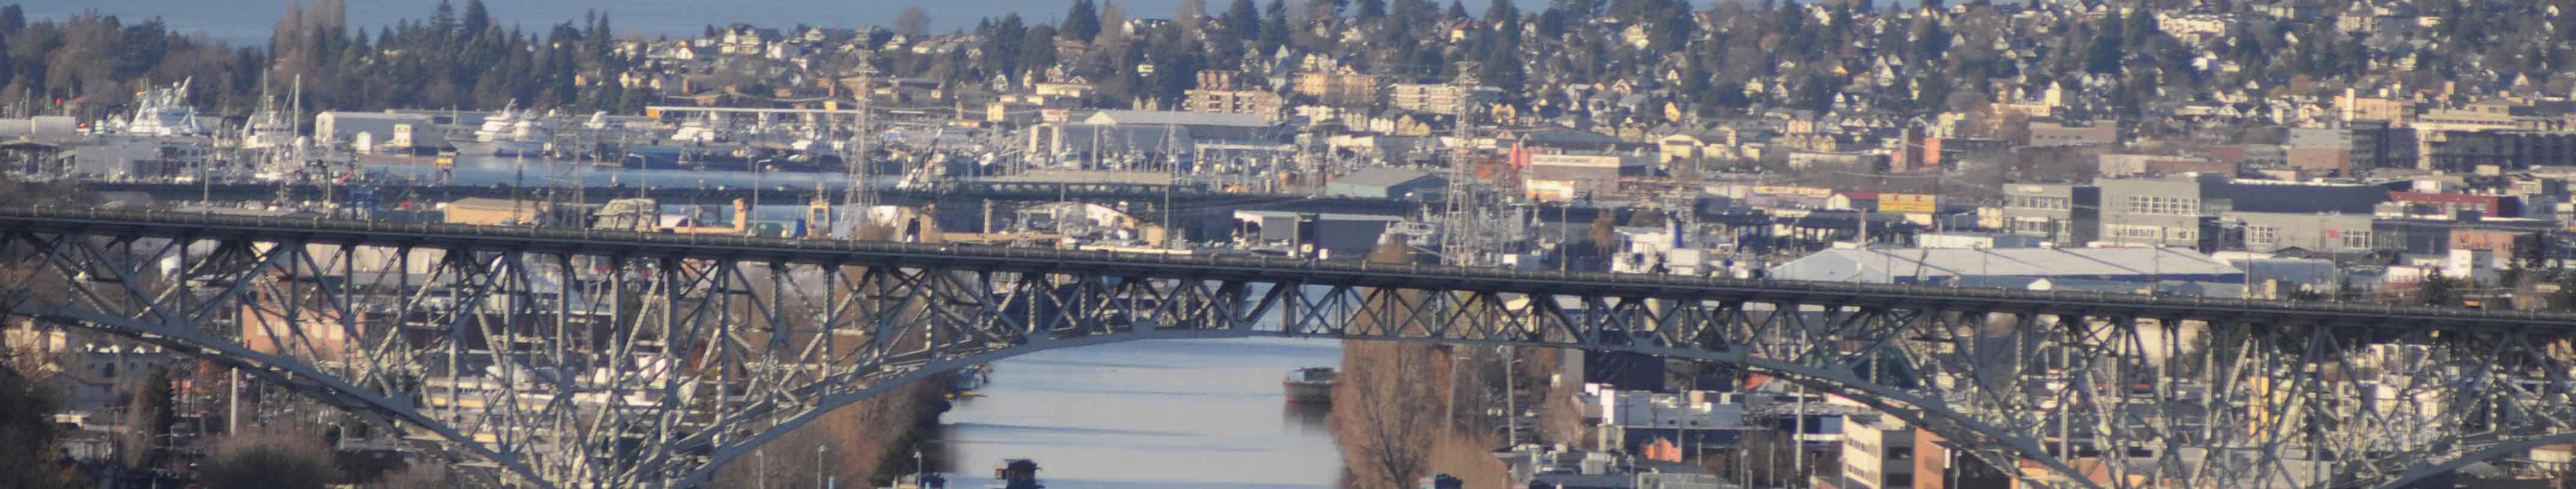 Seattle Fremont